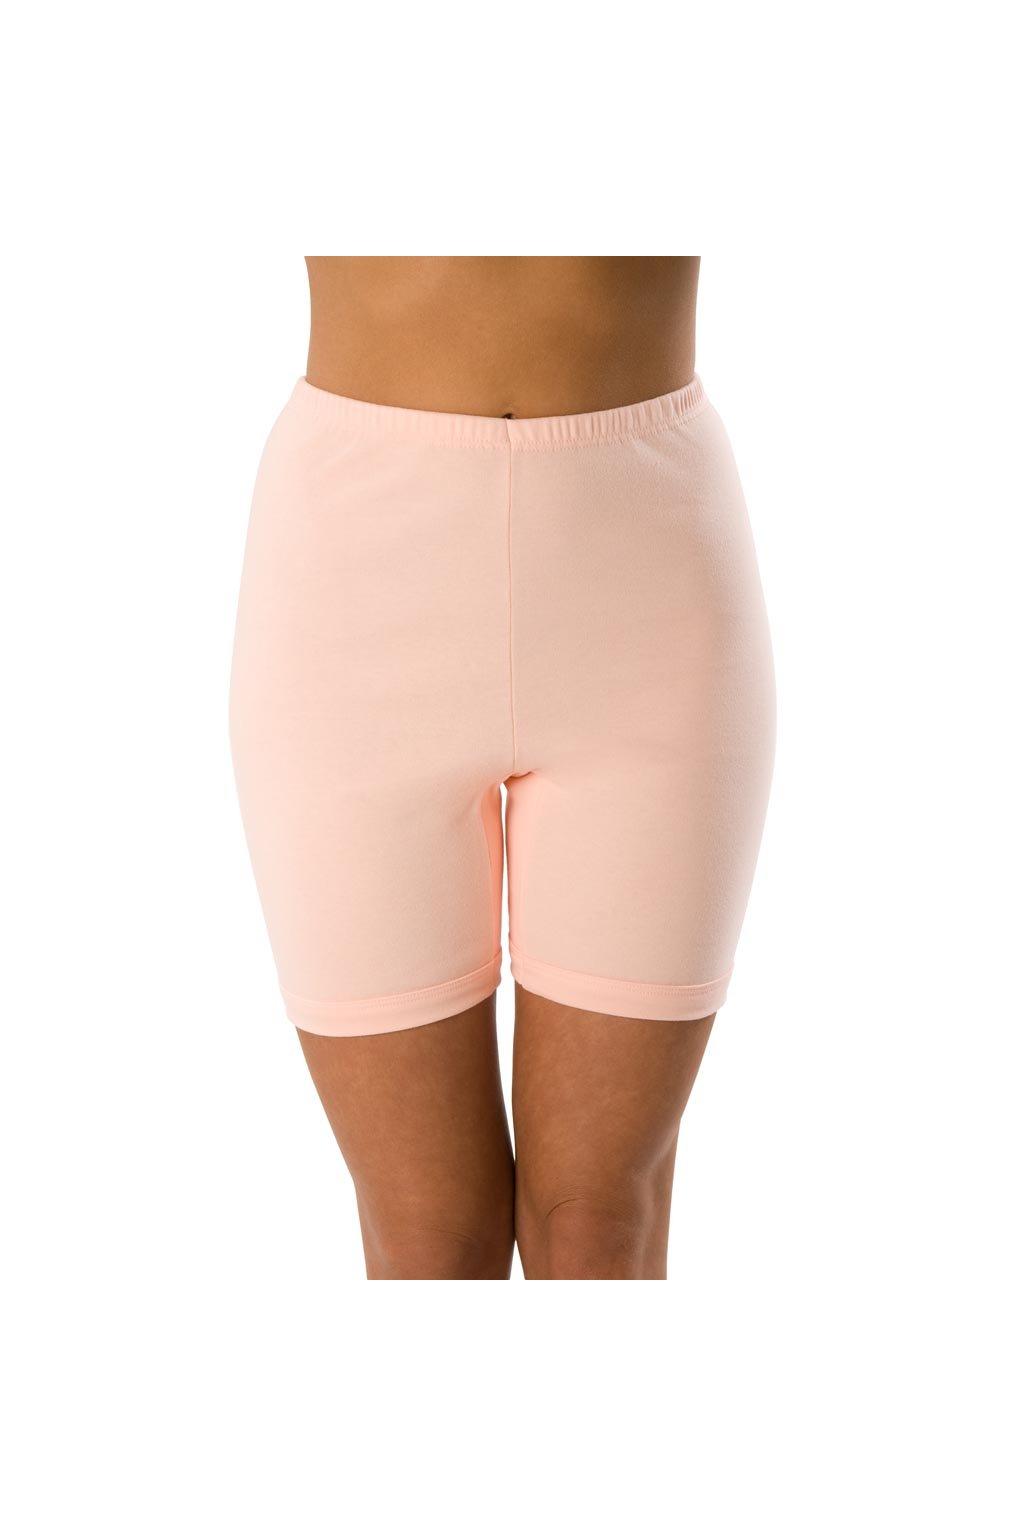 Nohavičkové kalhotky, 10016 510, mix barev